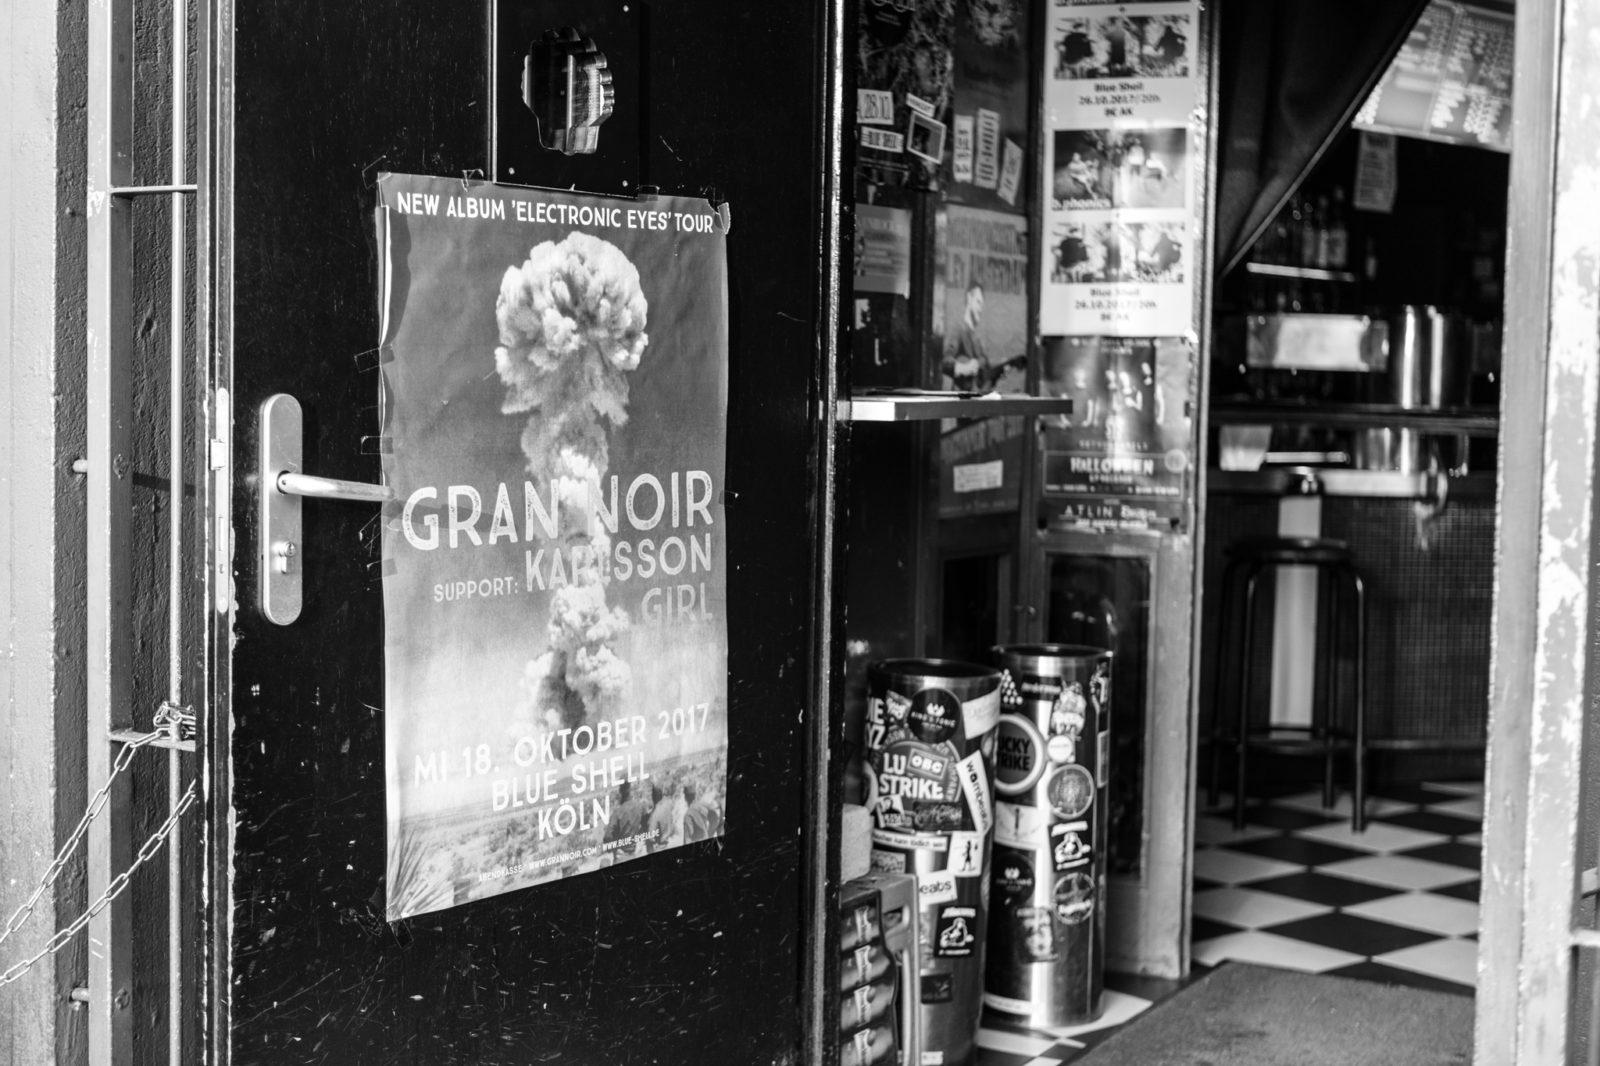 reportage: gran tour mit gran noir